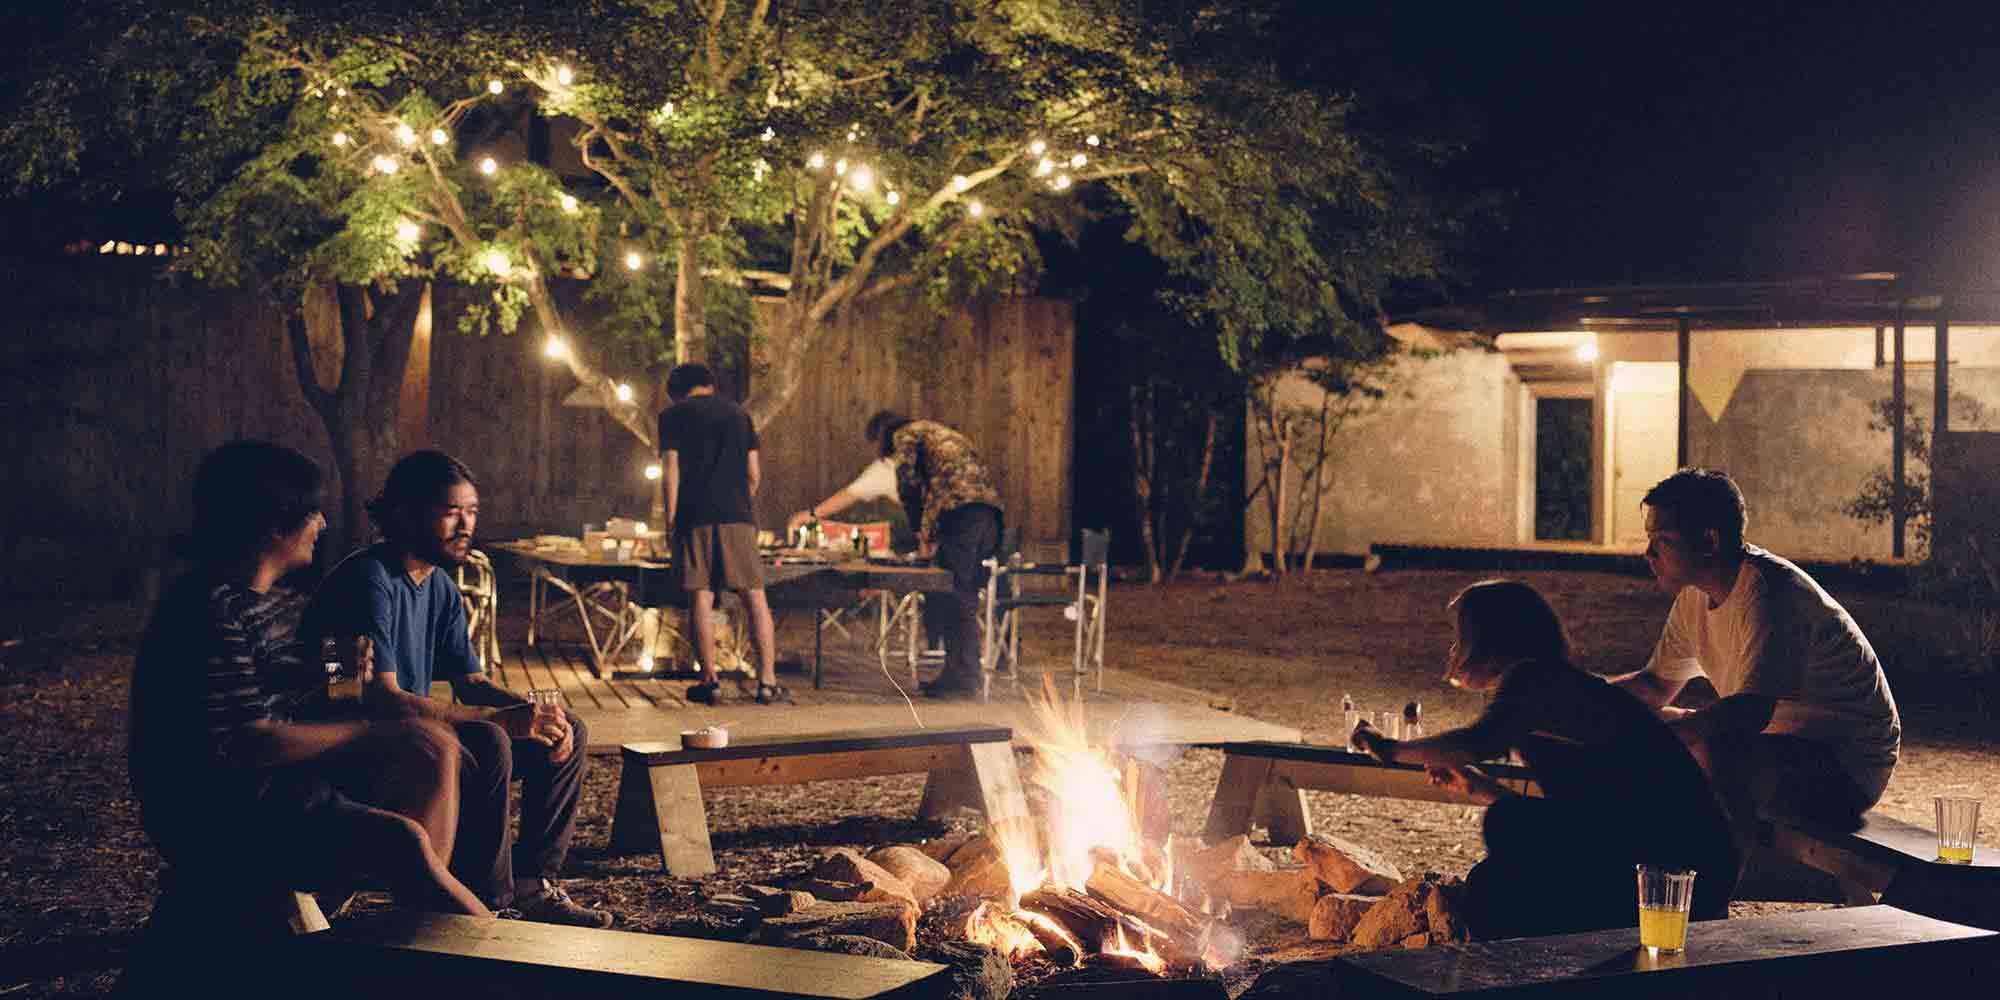 LOOF TINY HOUSE CAMP るうふ/ACTIVITY イメージ写真4